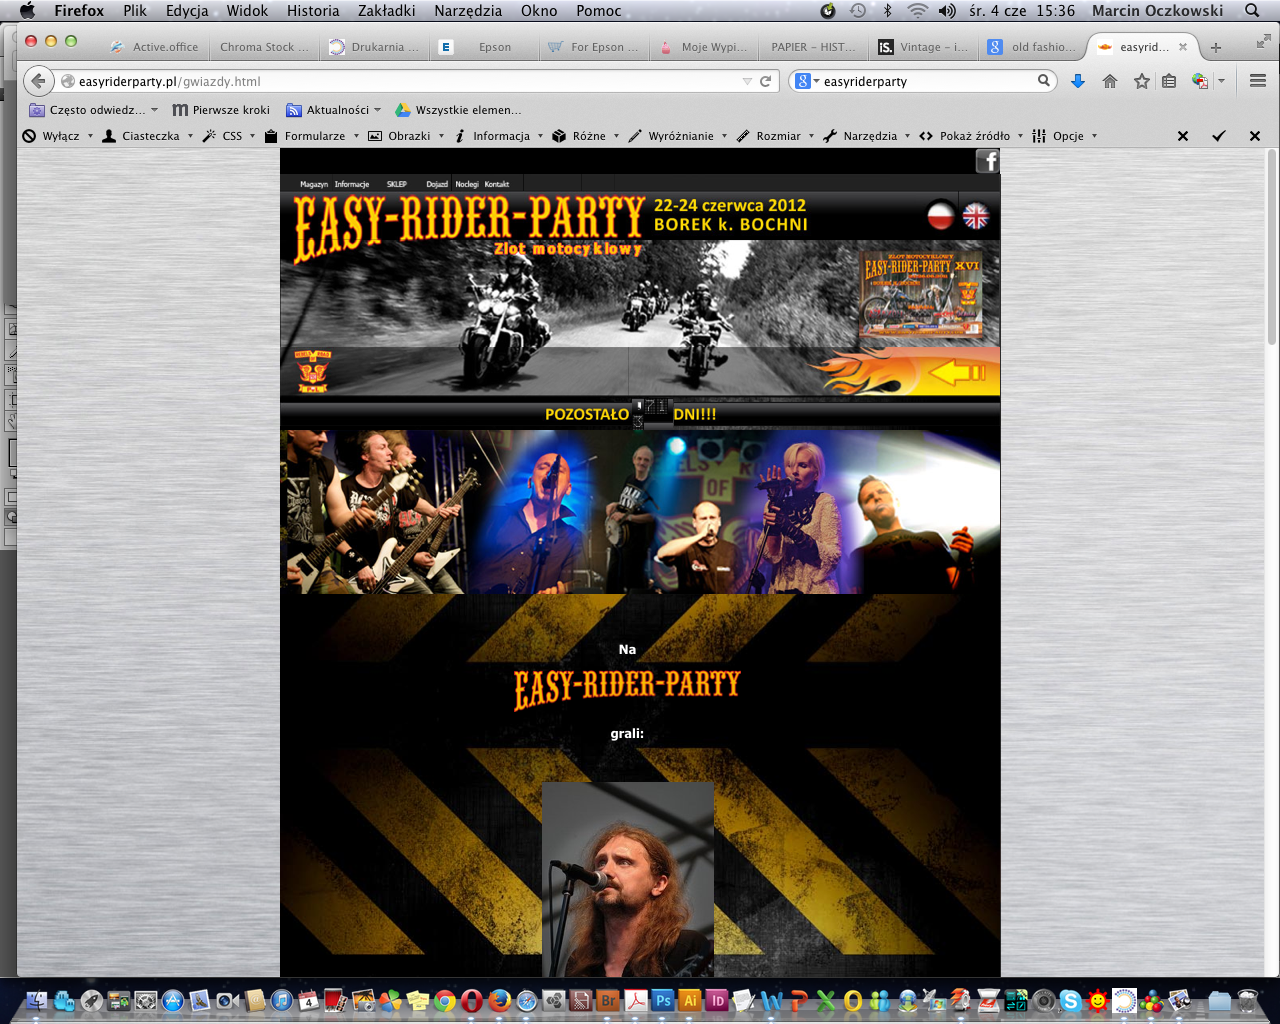 Zrzut ekranu 2014-06-4 o 15.36.41